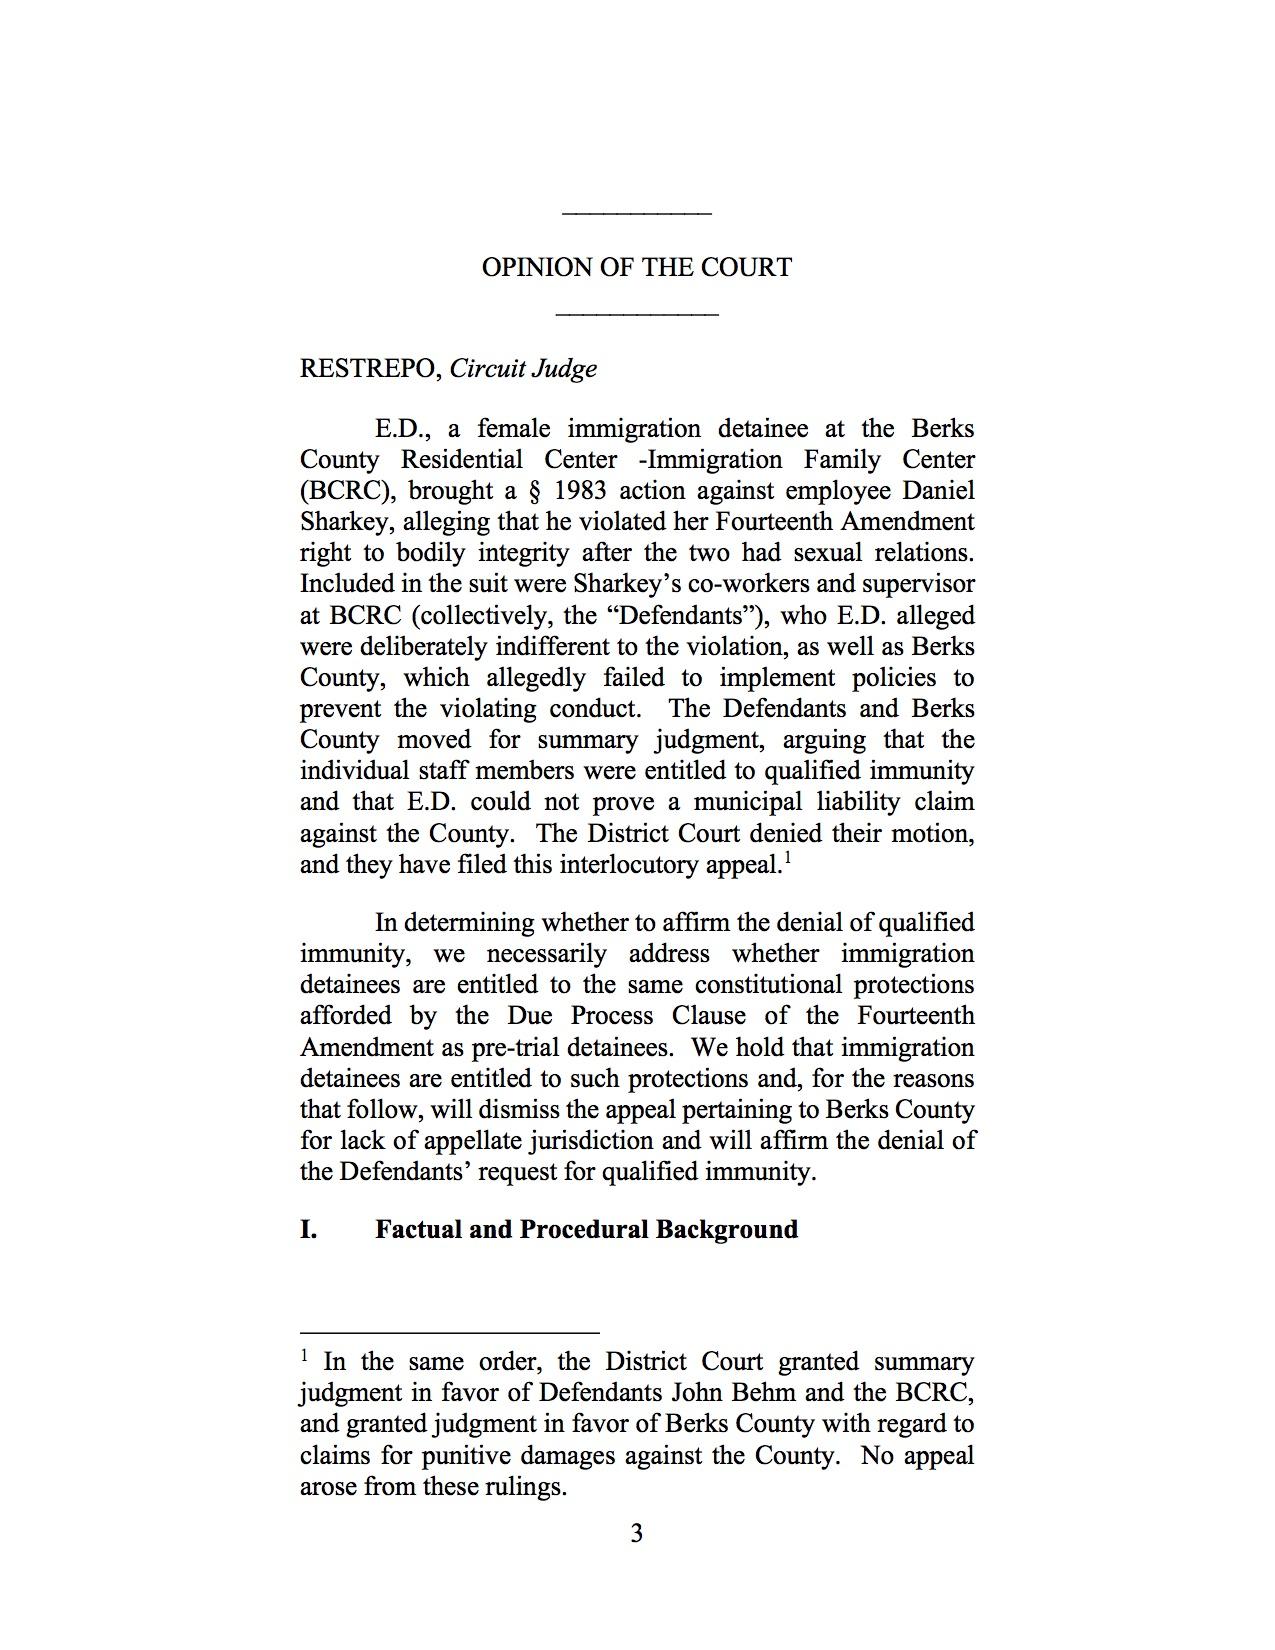 E.D. v. Sharkey 3rd Circuit Opinion.3.jpg